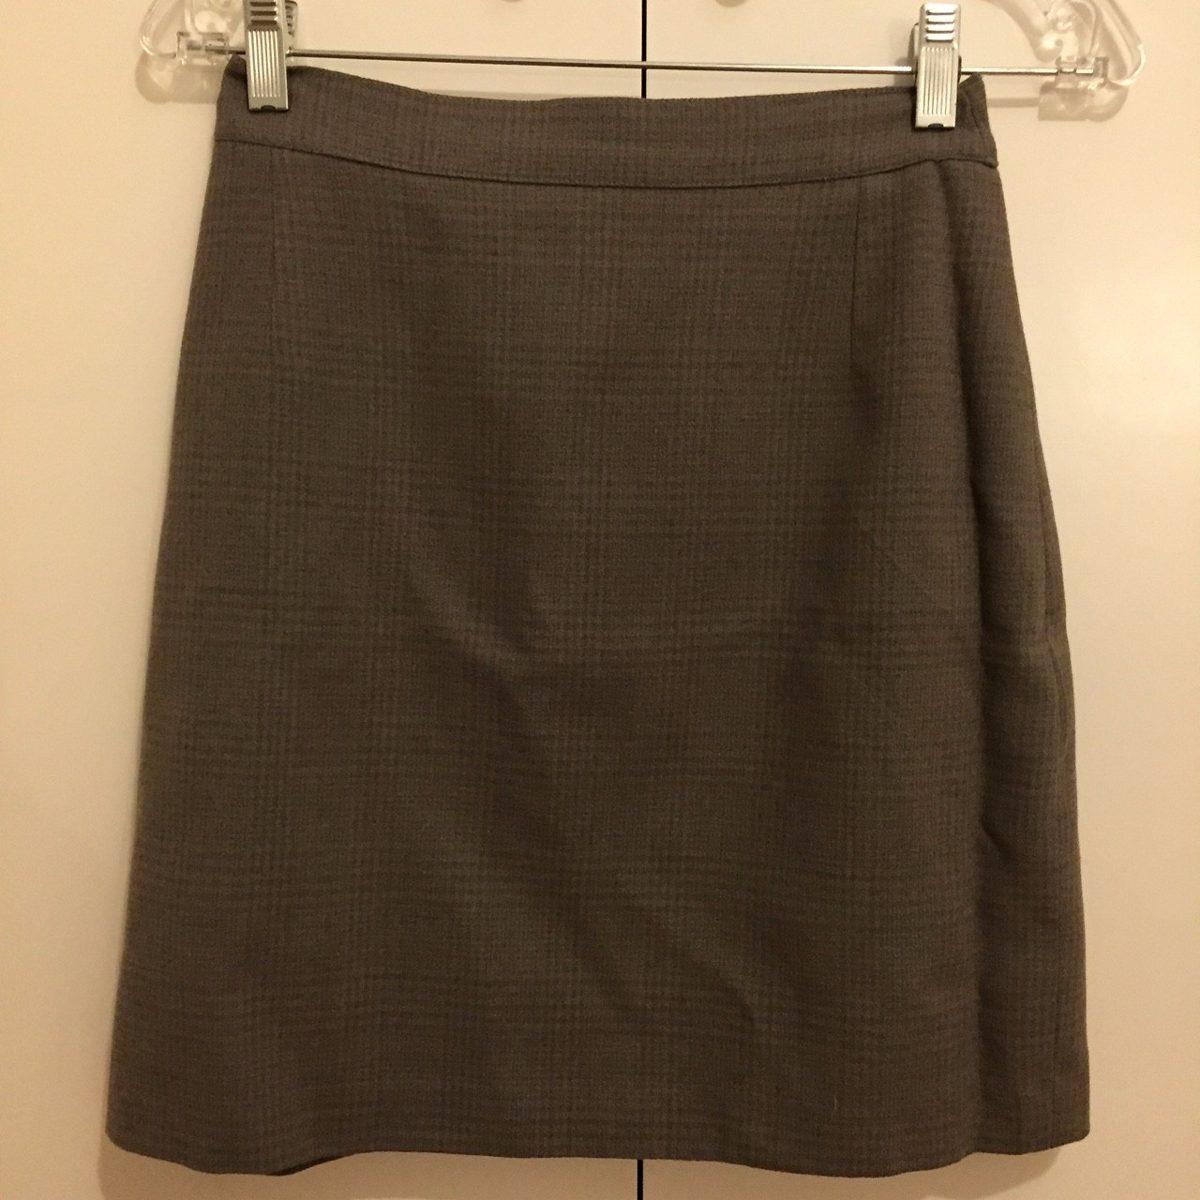 Cargando falda zoom talle vestir mujer recta m TwgvT 8f8d2229f93